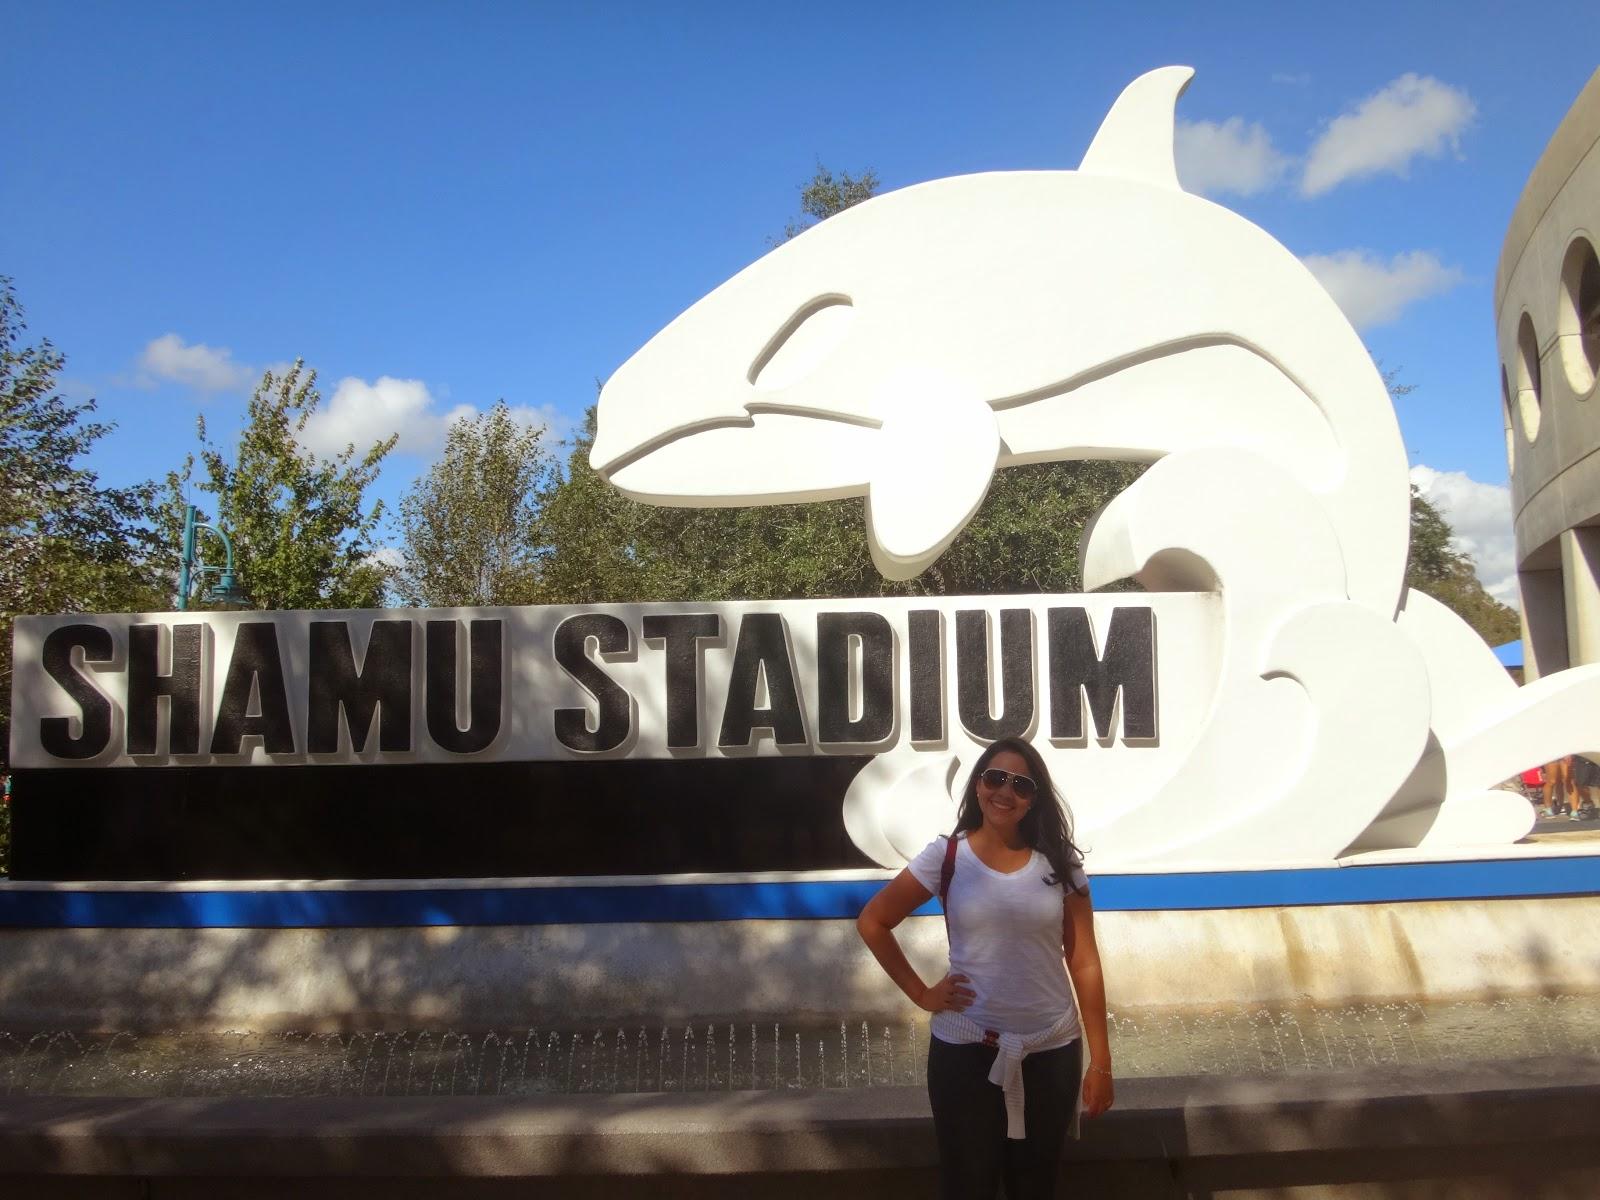 shamu stadium - Parque sea world - orlando, florida